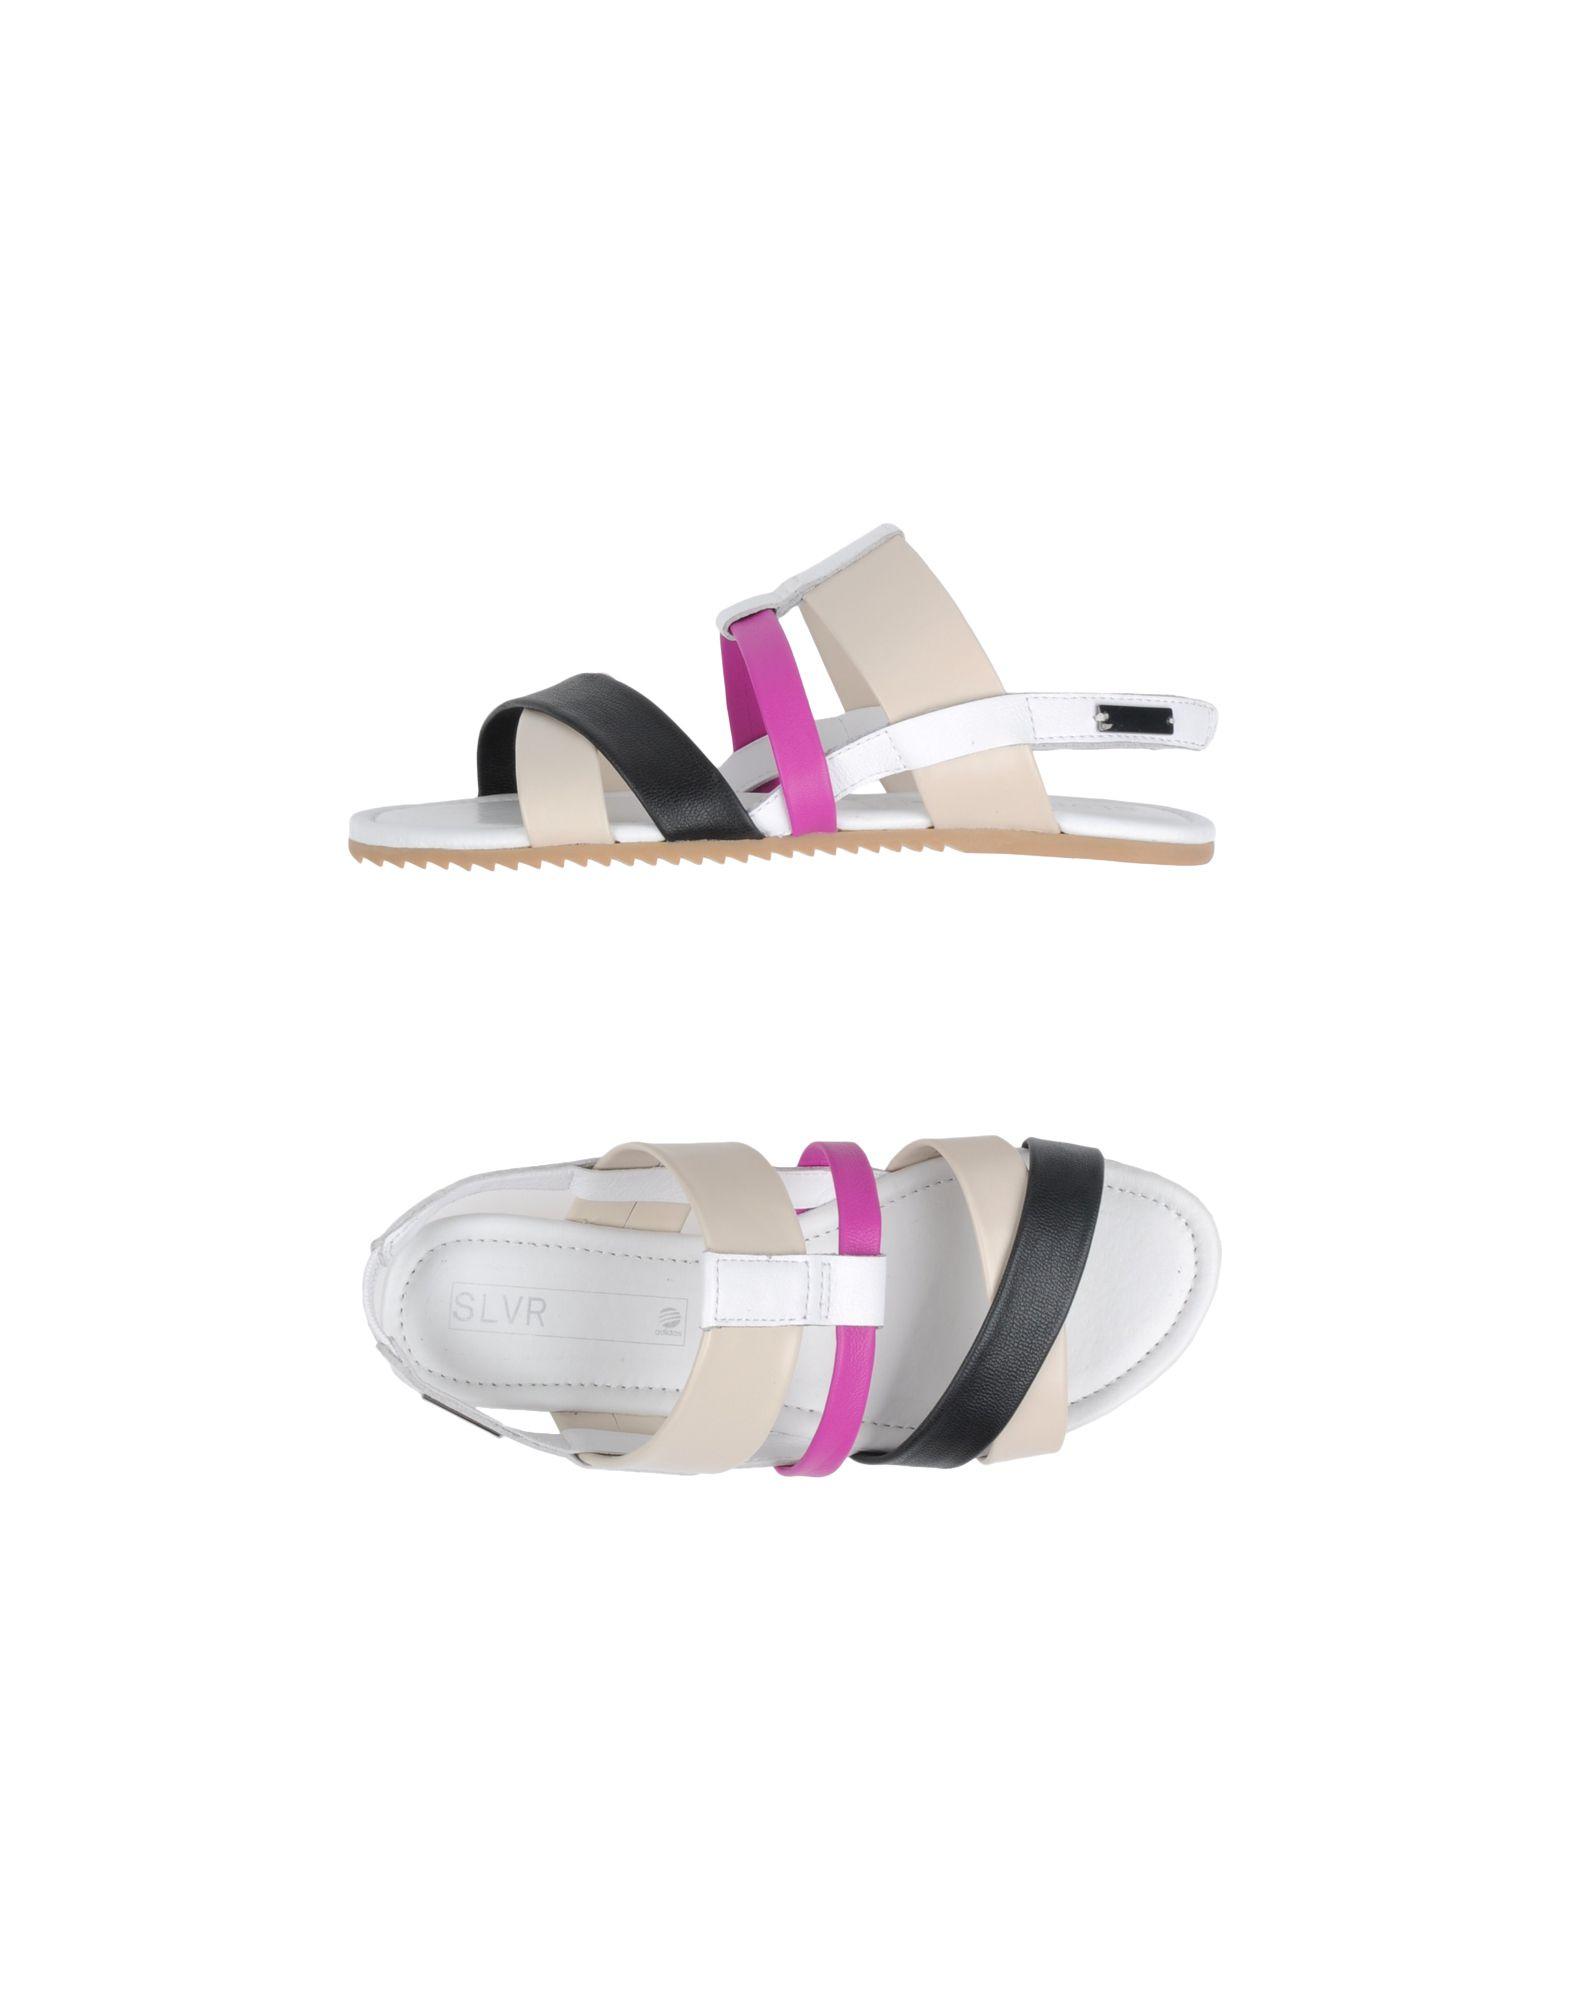 f207366e8 Lyst - Adidas SLVR Sandals in White